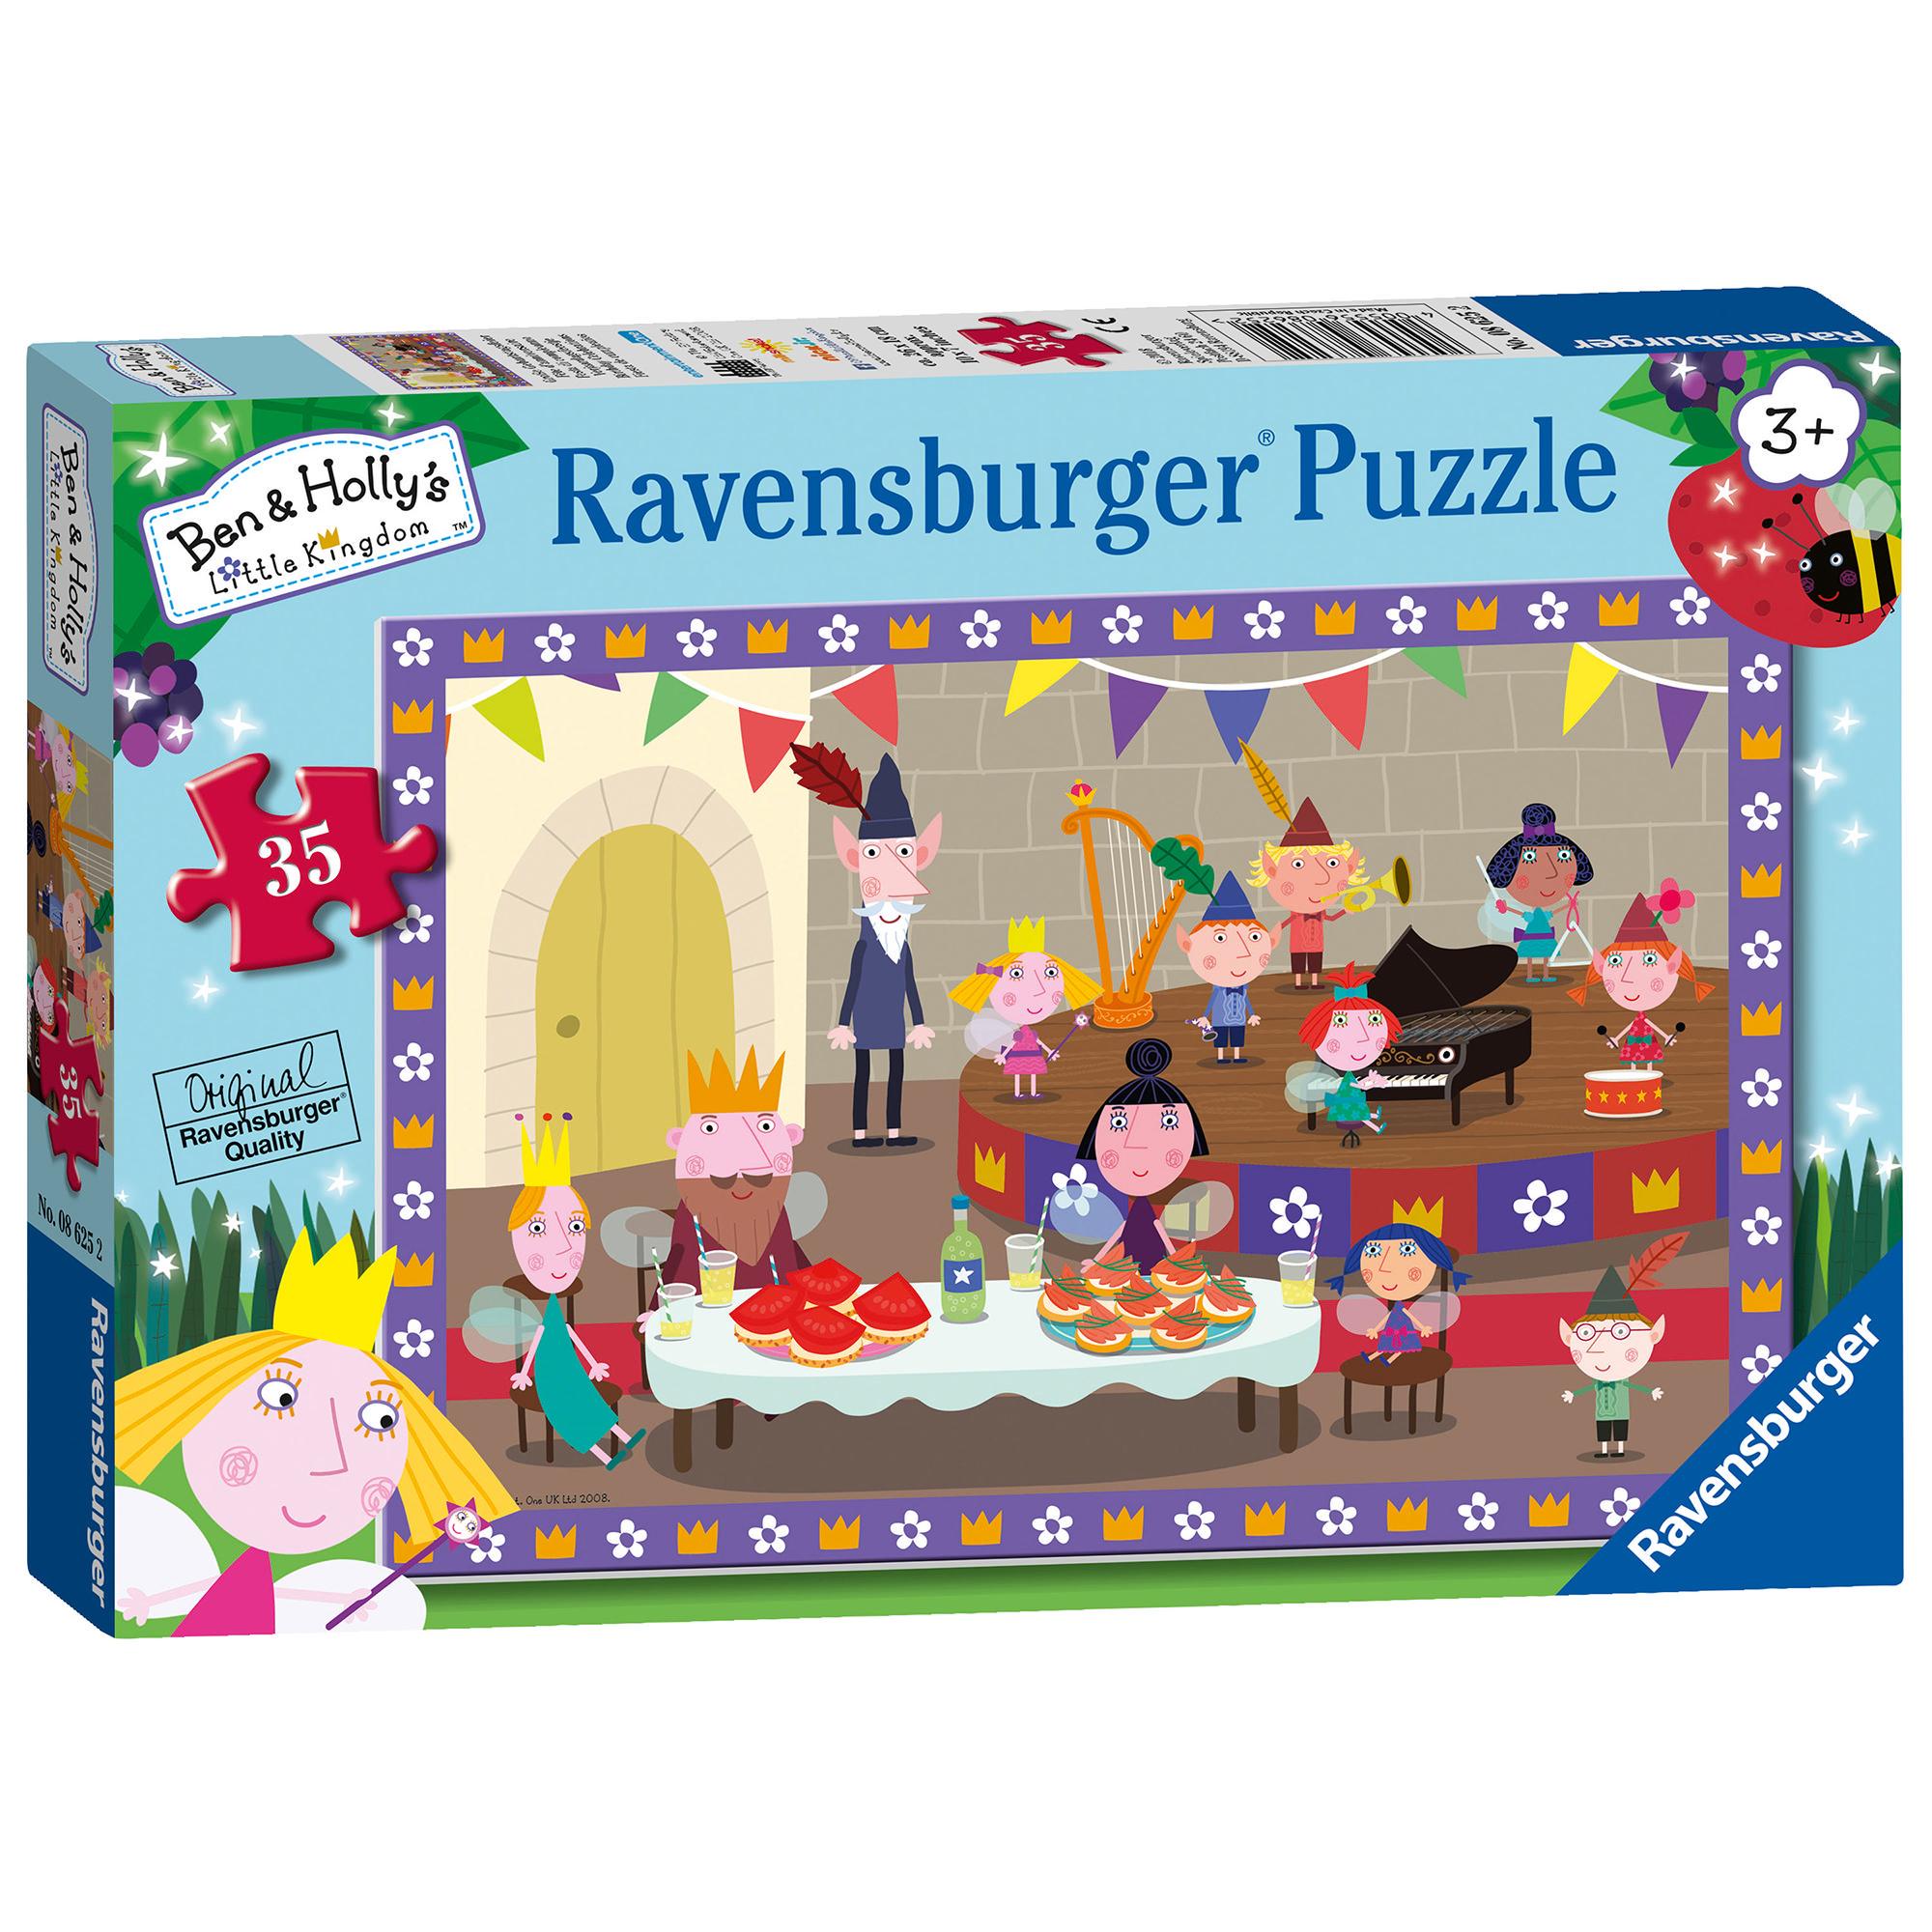 Ravensburger Ben & Holly 35pc Jigsaw Puzzle